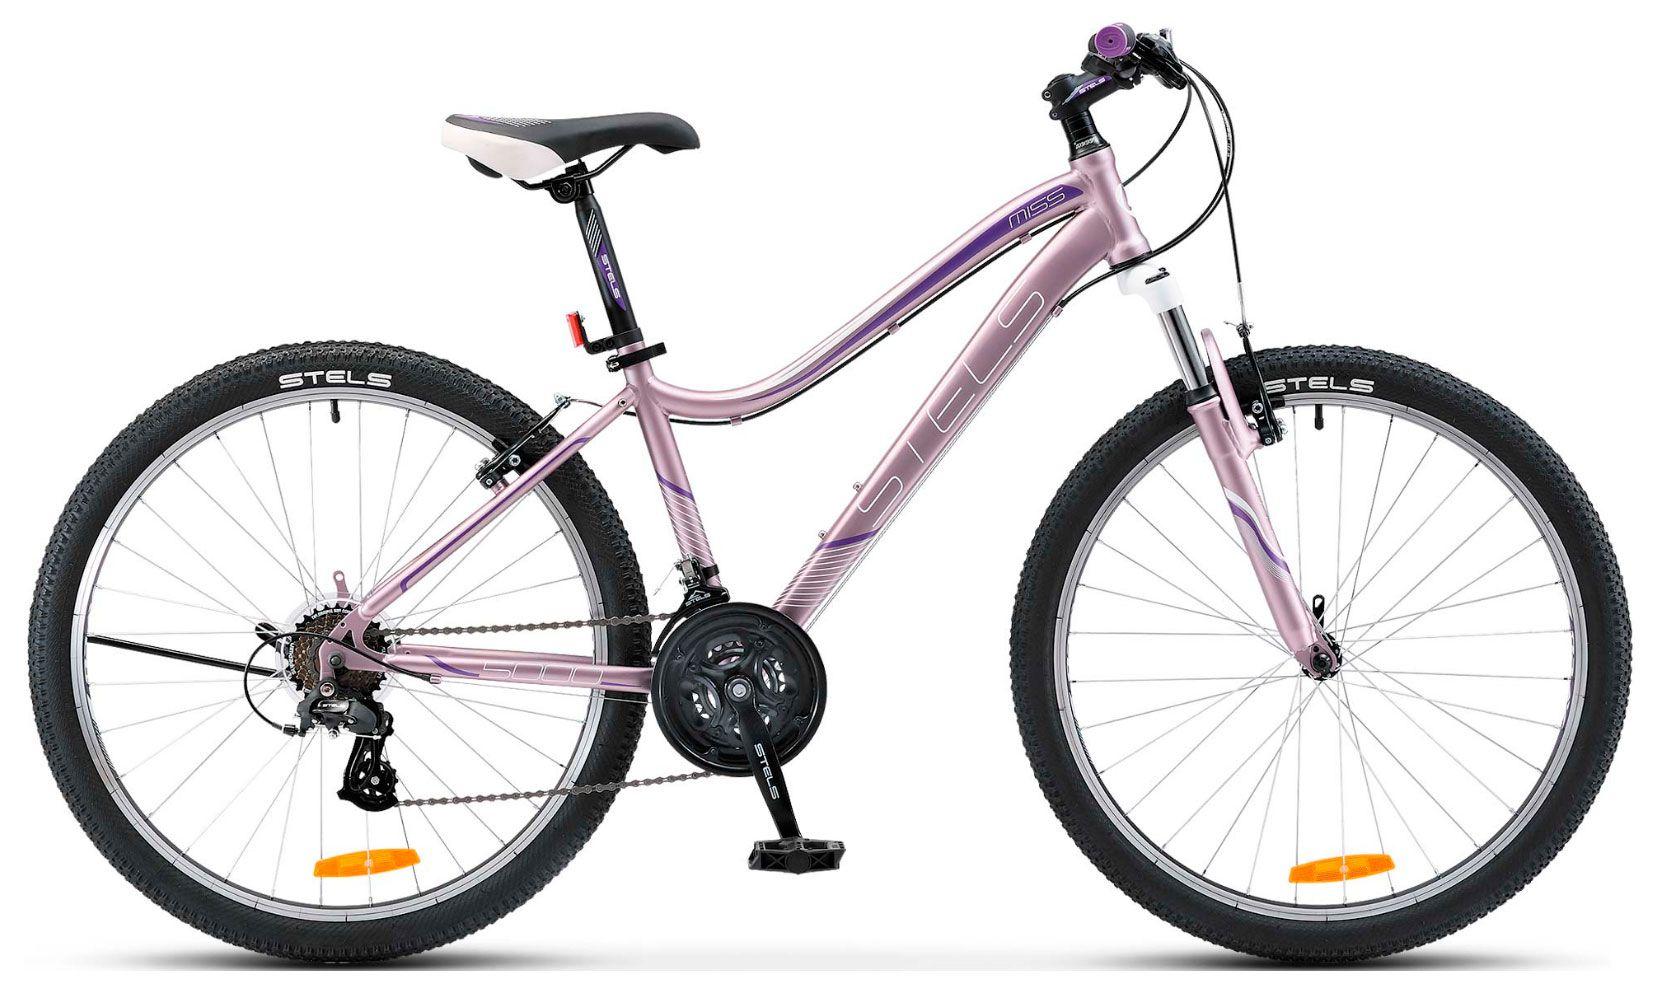 Велосипед Stels Miss 5000 V 26 (V030) 2018,  Горные  - артикул:293443